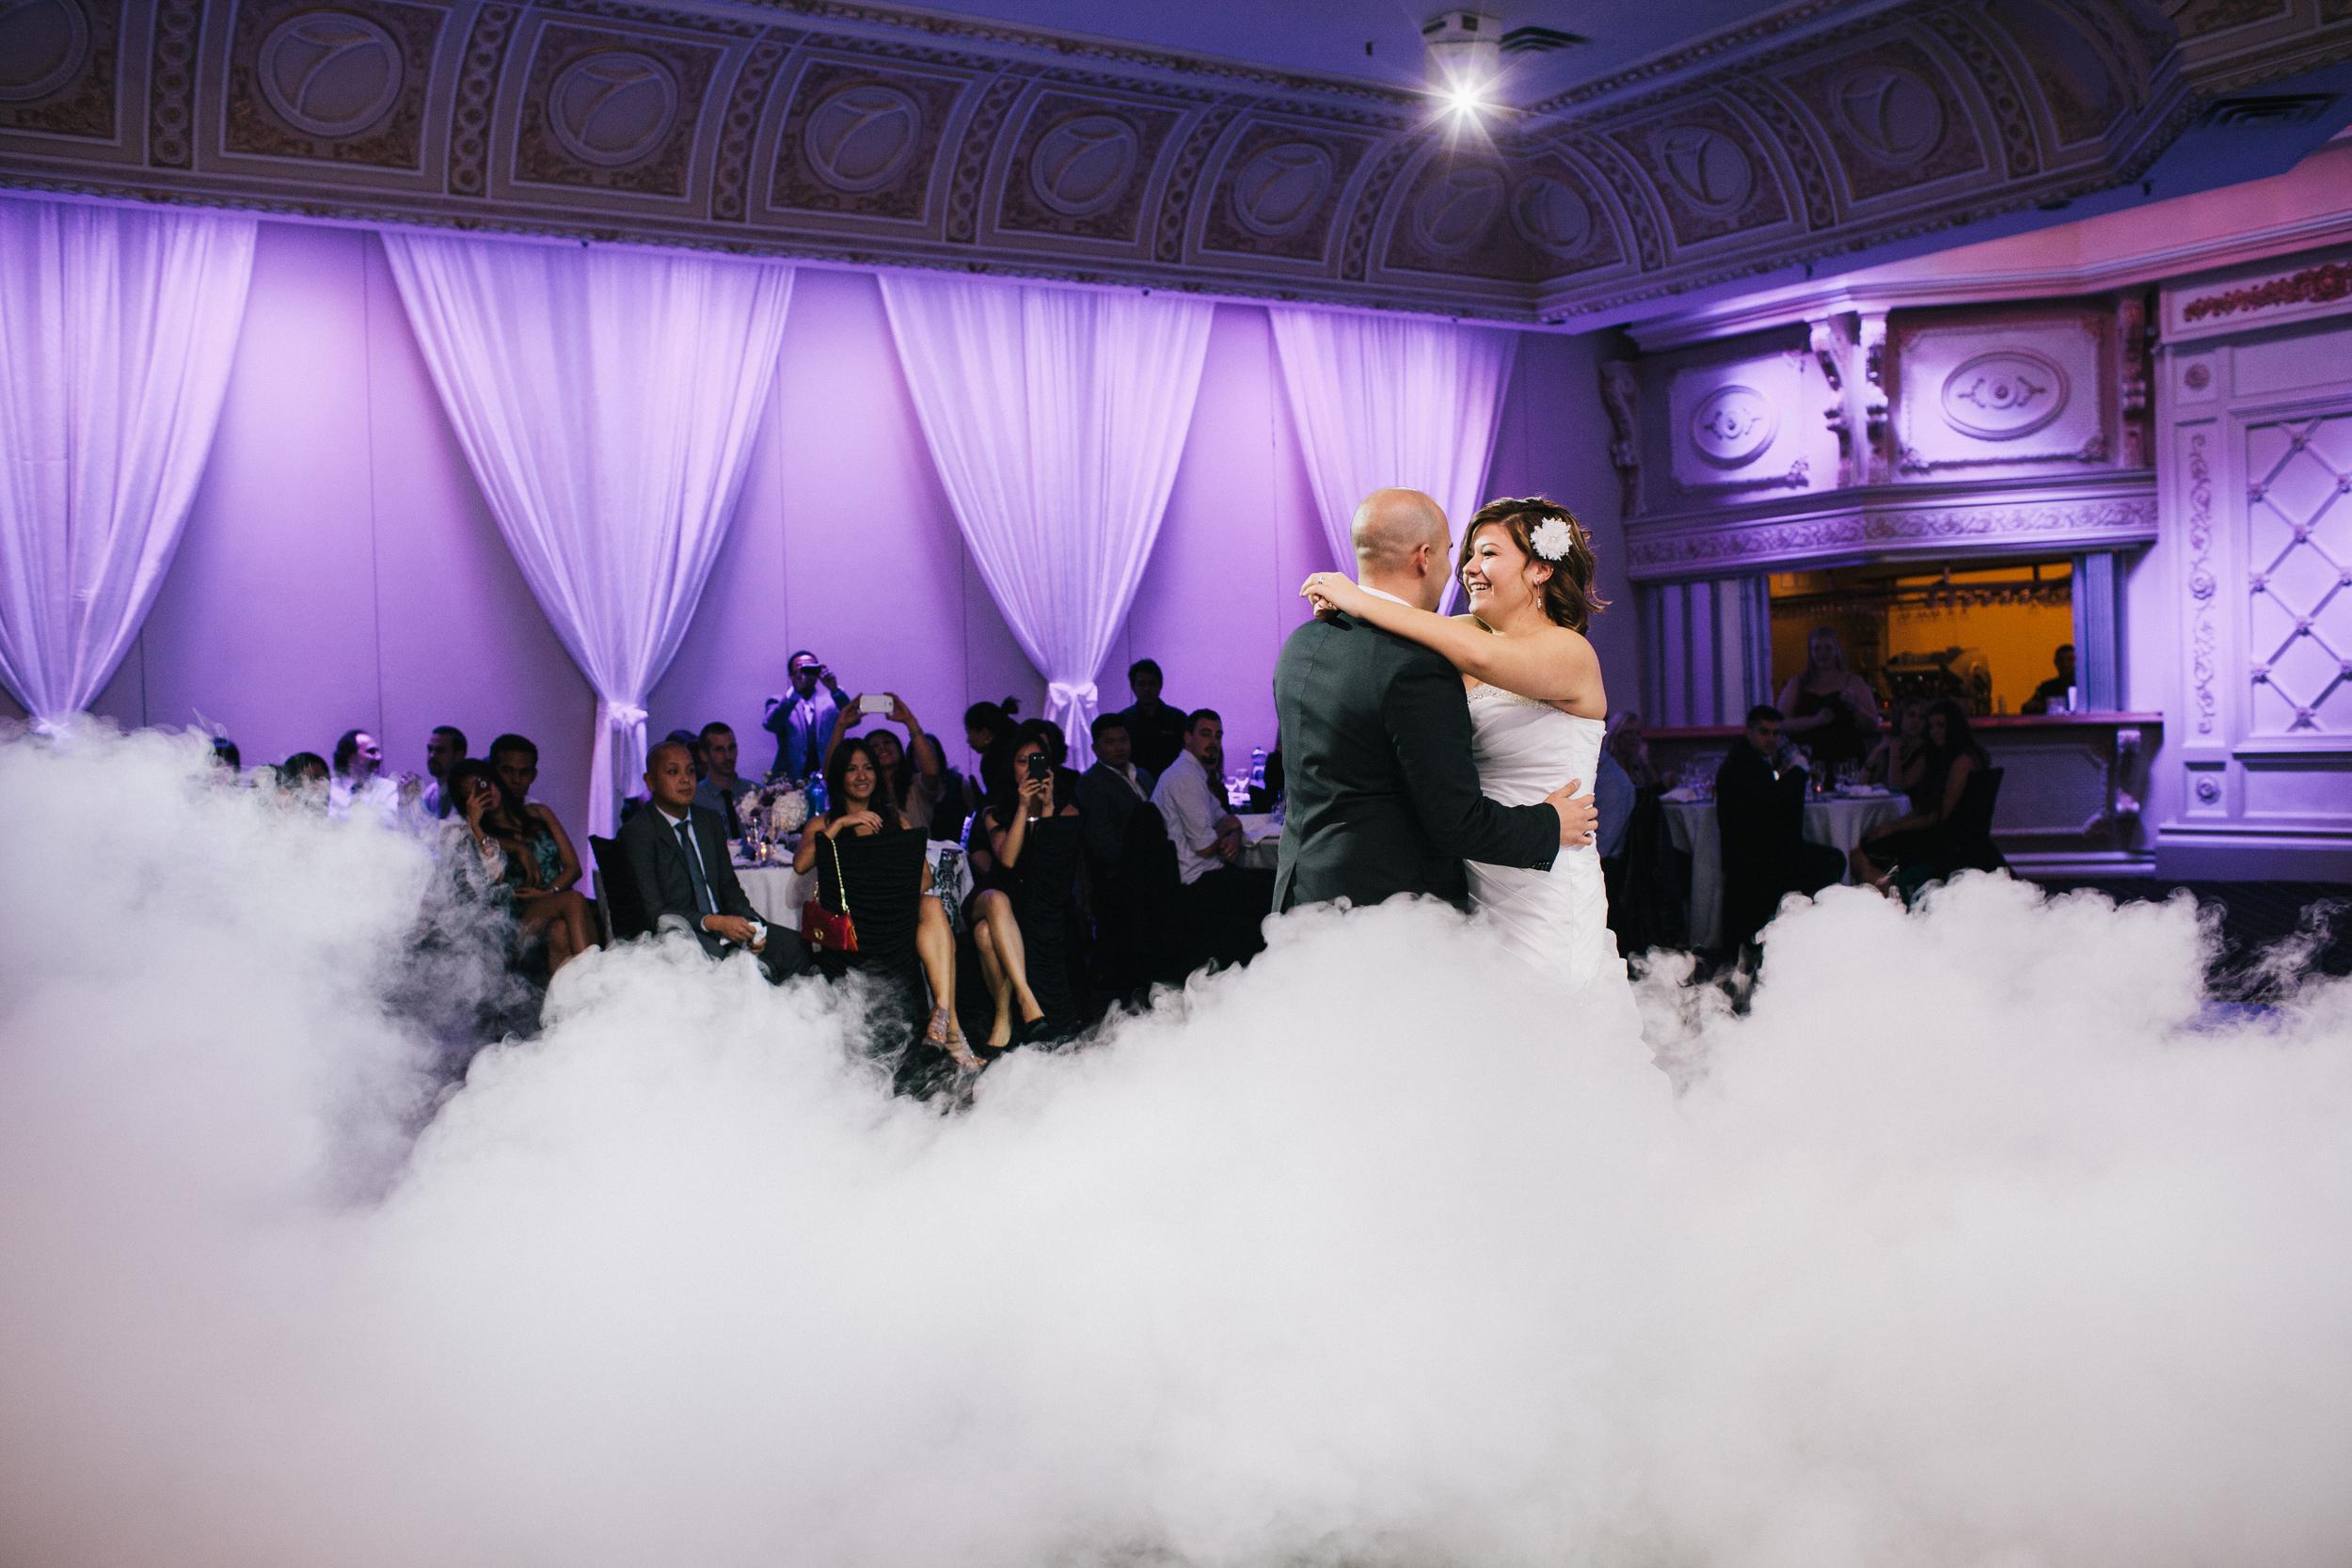 Stephanie-Kyle-paradise-banquet-hall-michael-rousseau-photography-best-toronto-wedding-photographer-documentary-wedding038.JPG